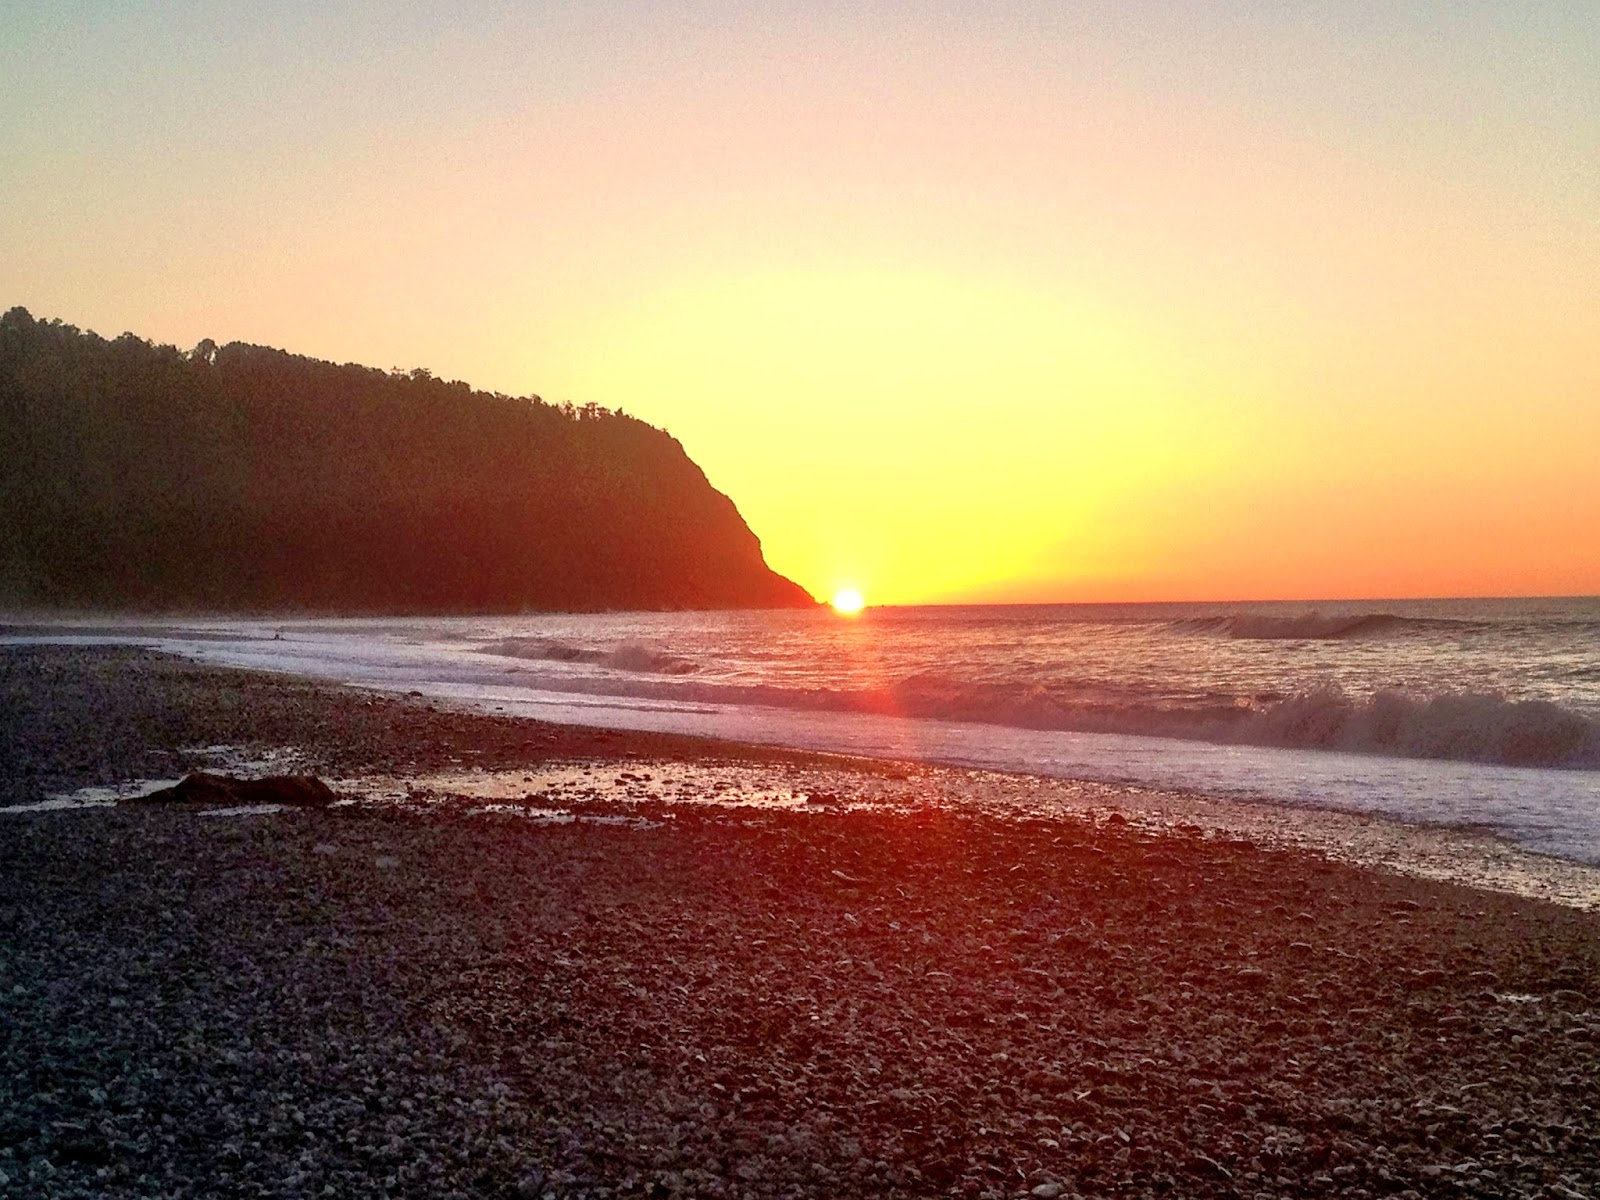 Sunset on the beach of Okarito - South Island, New Zealand